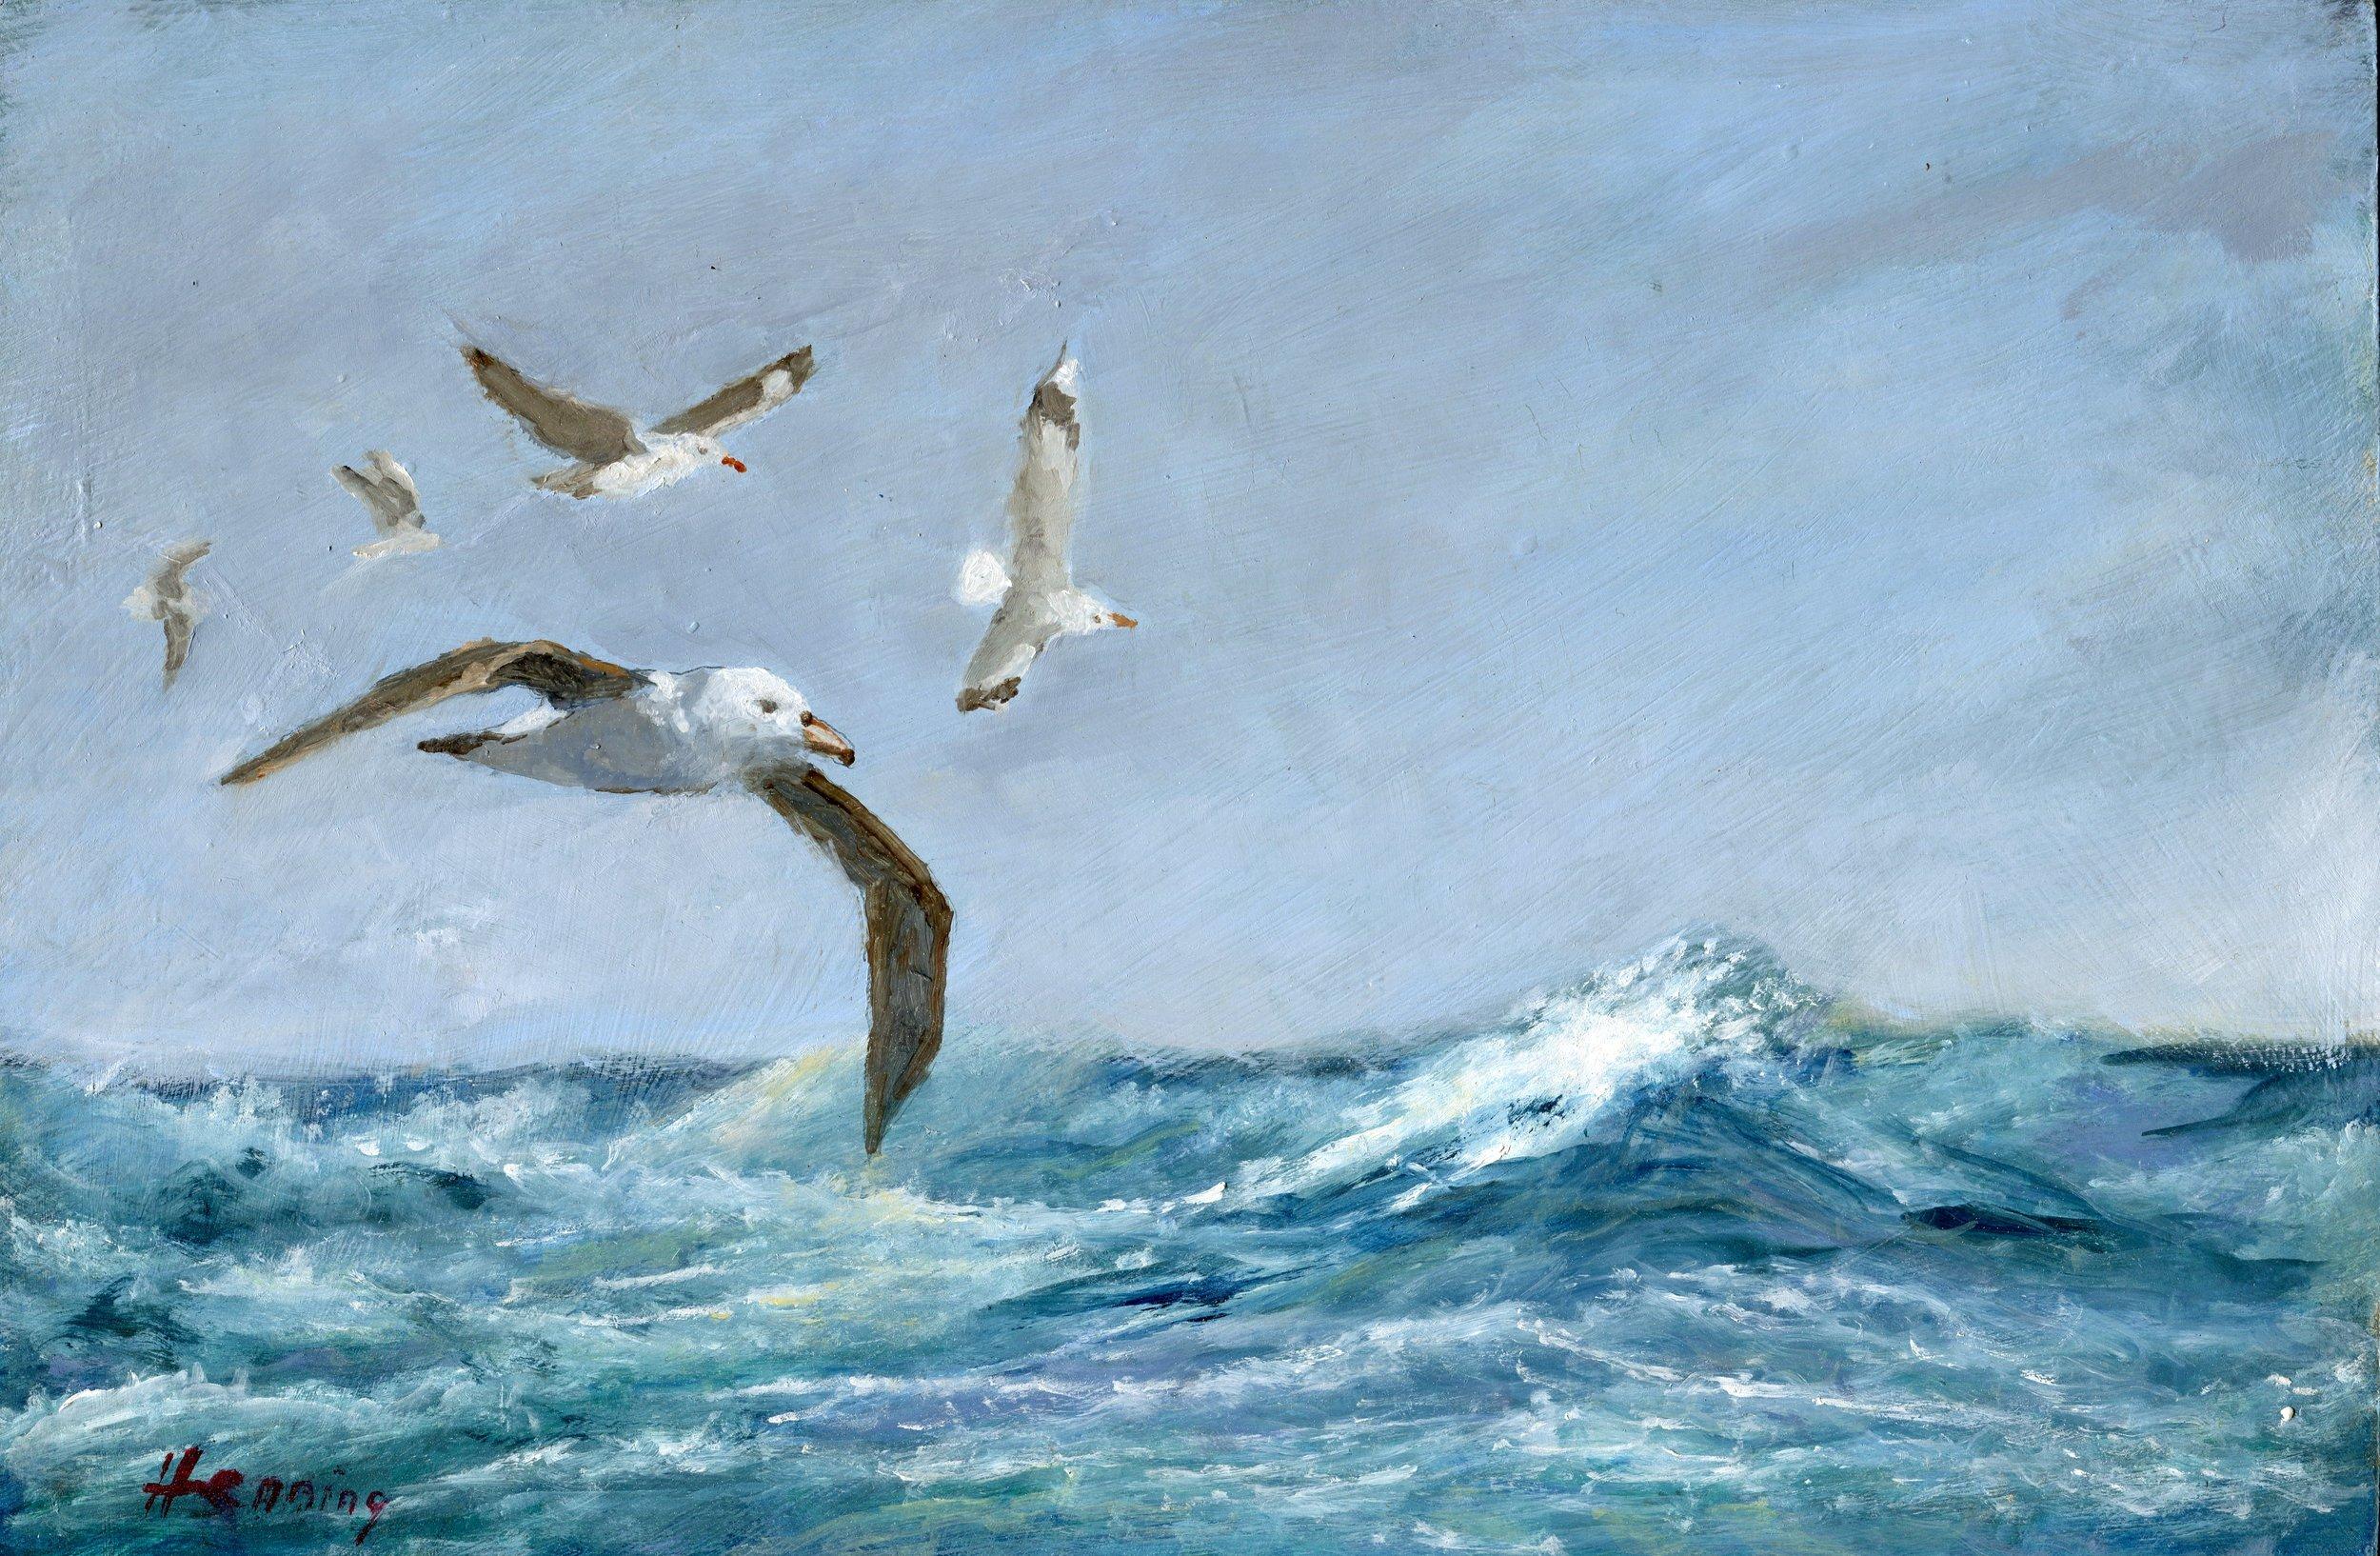 16a  Dennis Henning  Seascape with albatross  oil on board